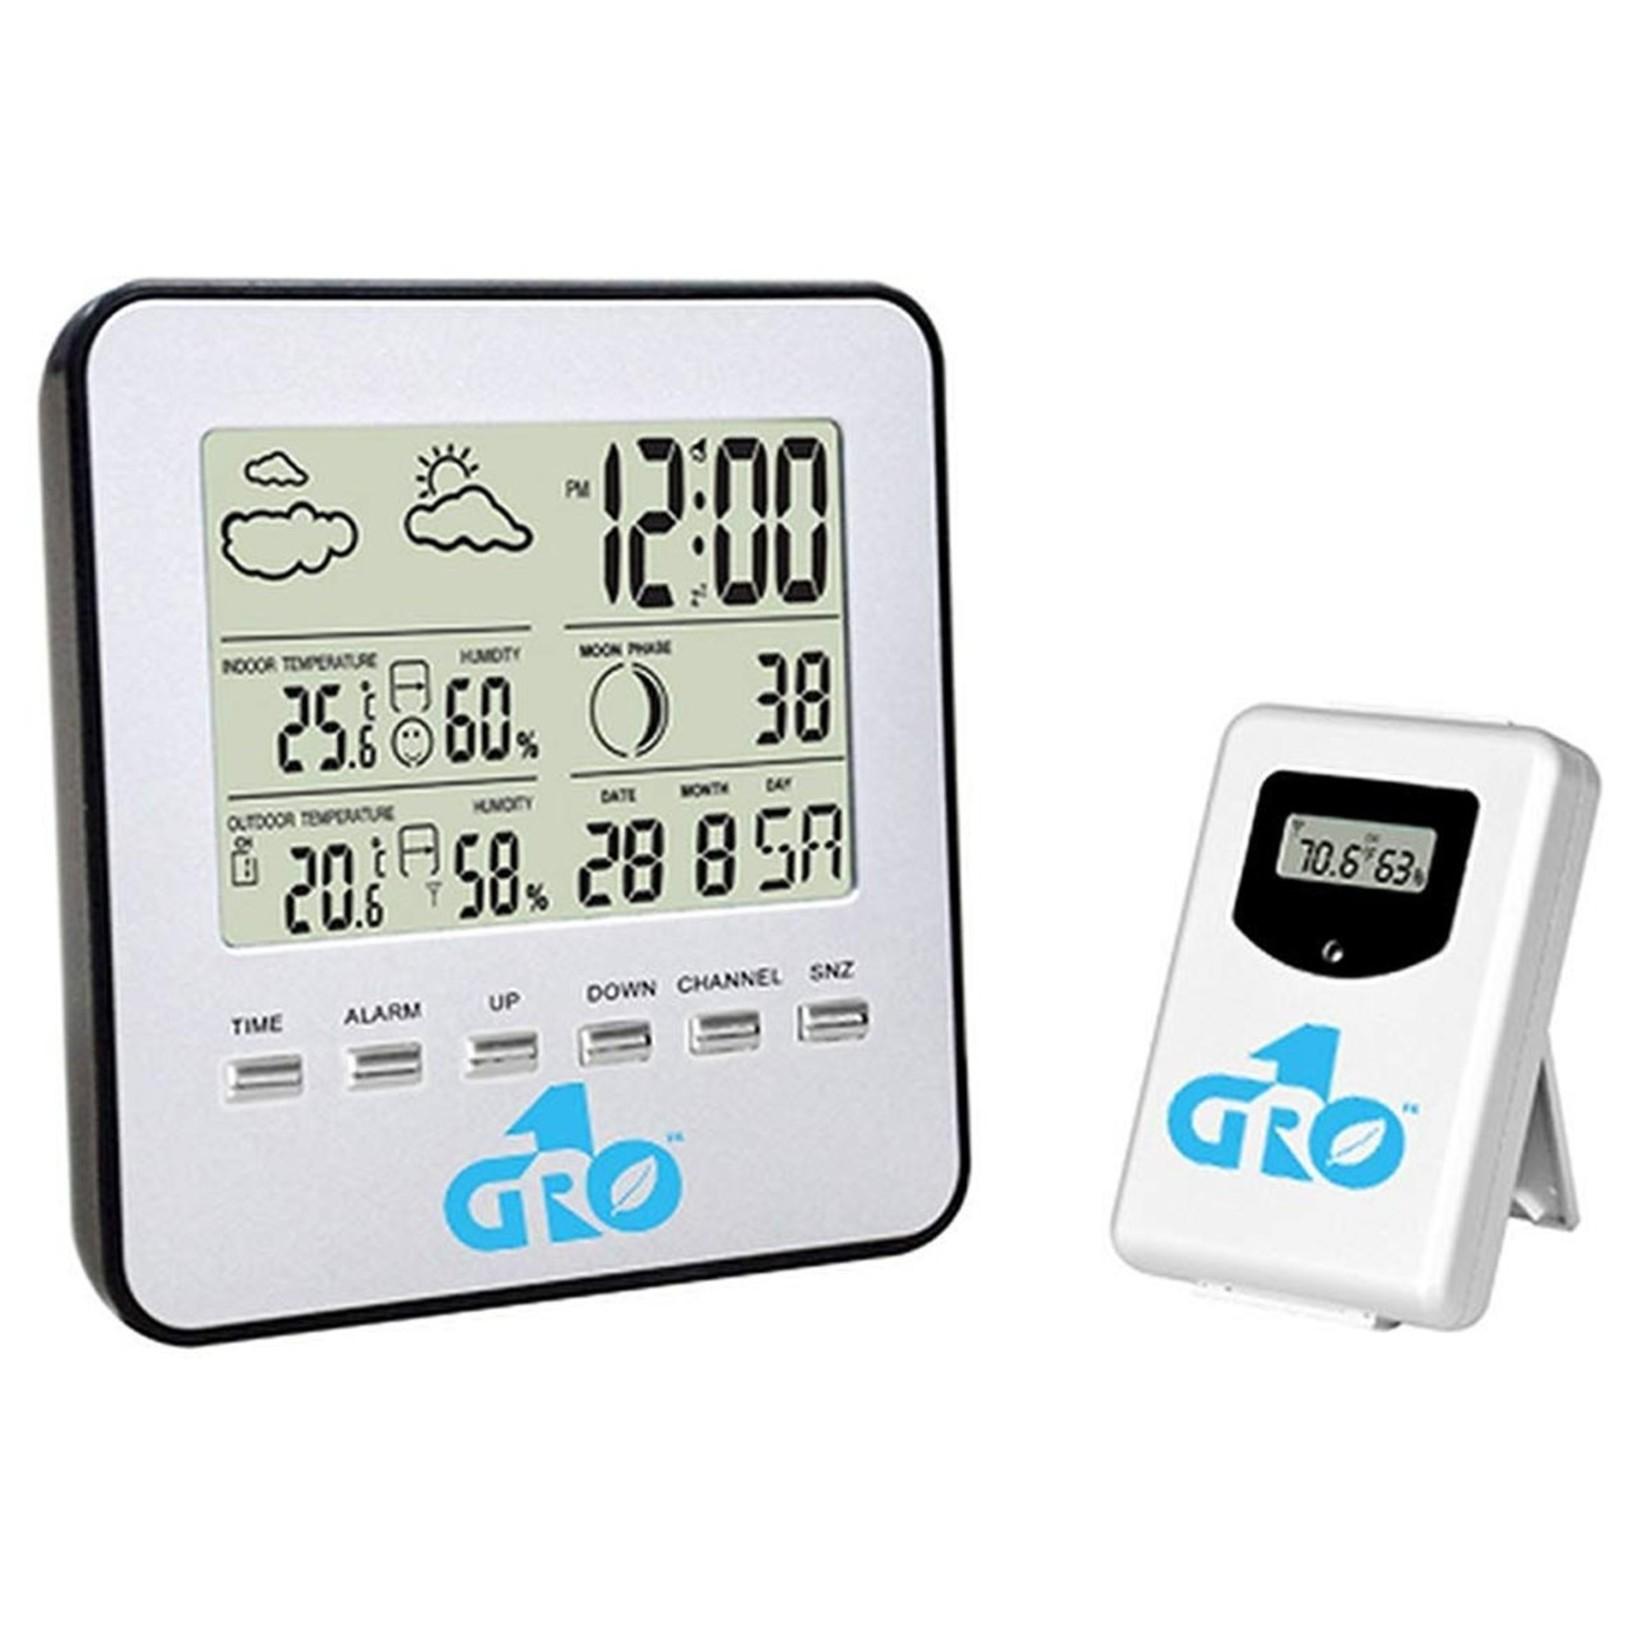 Gro1 Gro1 Wireless Weather Station & Sensor